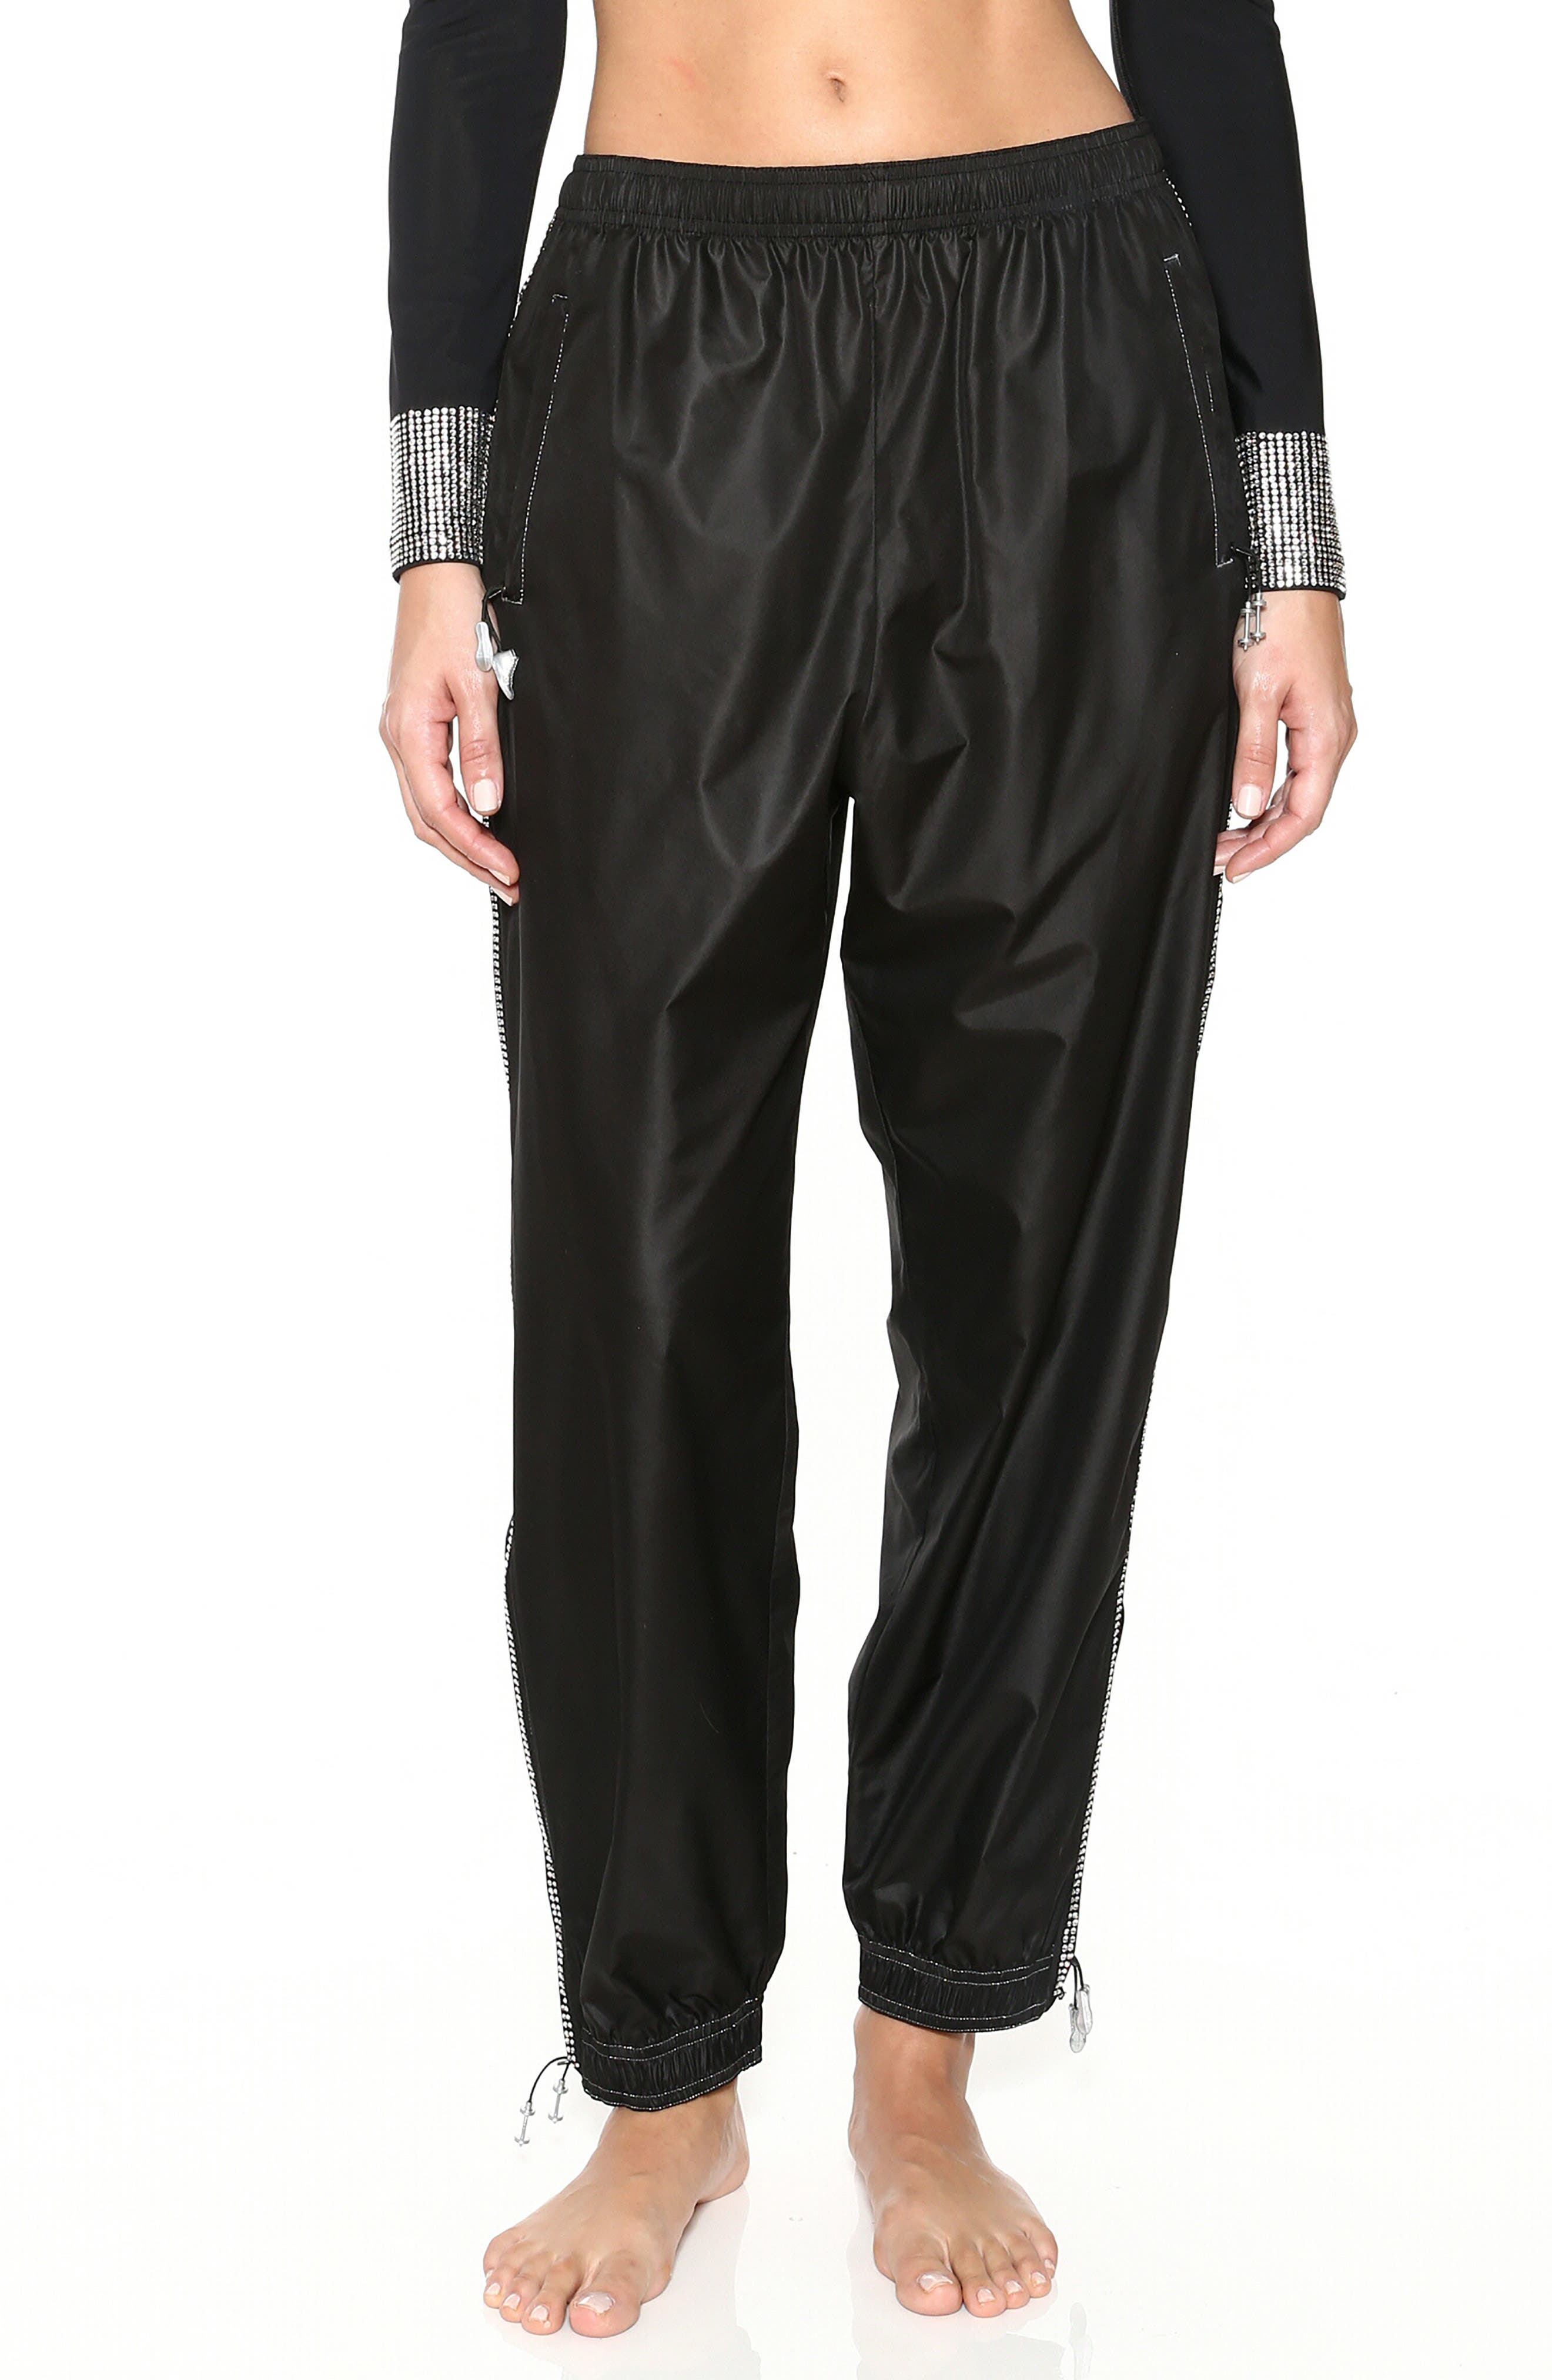 Adam Selman Sport Embellished Track Pants, Black